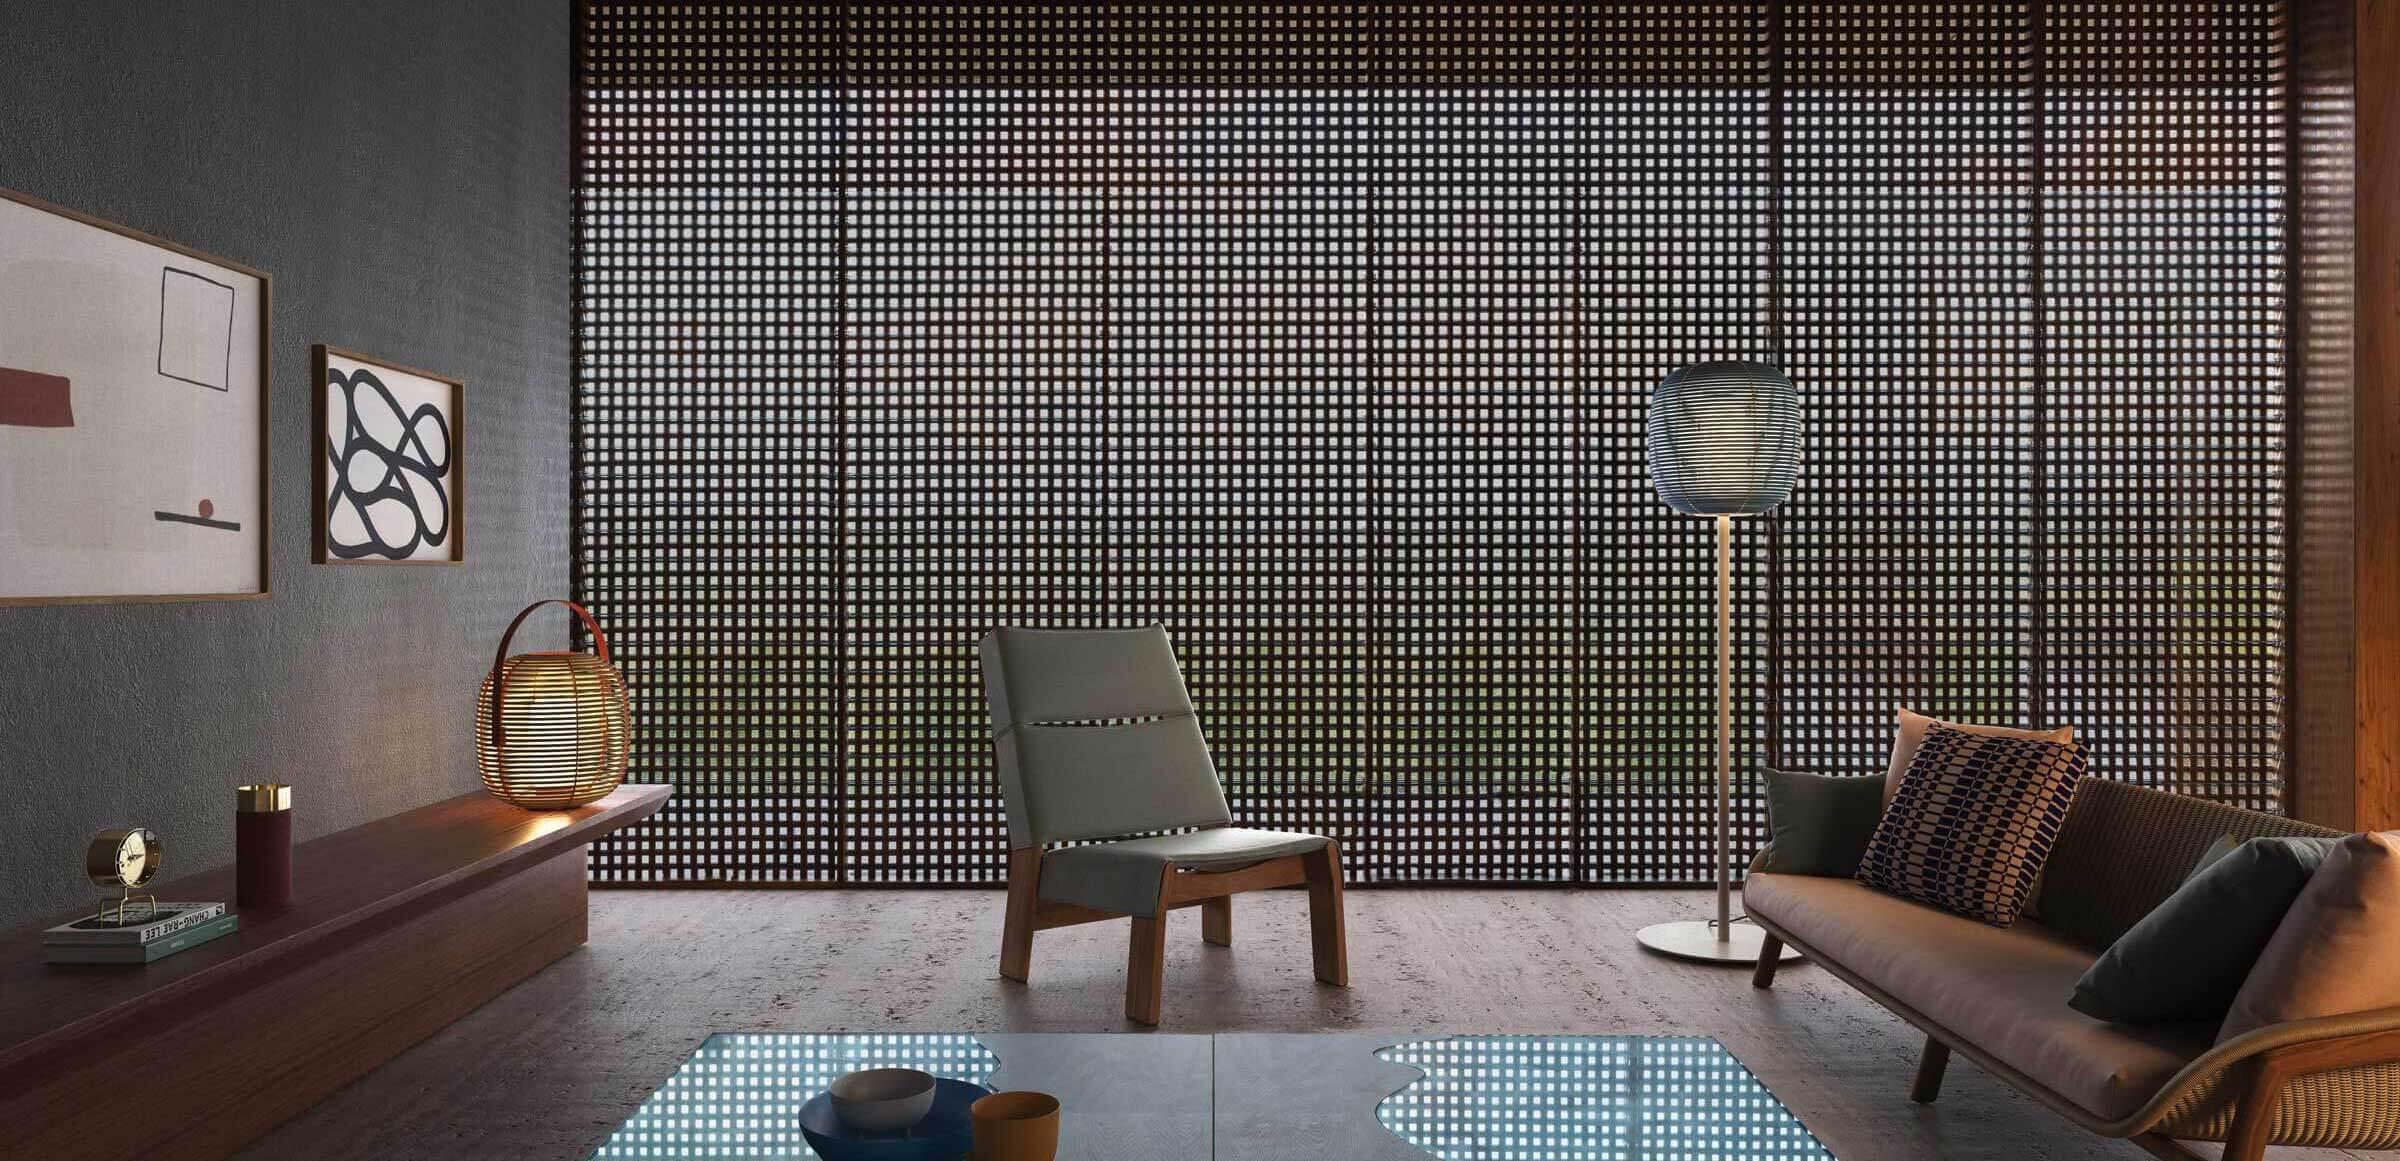 foto_slider_1593_0_Bela_lamp_inhouses.jpg